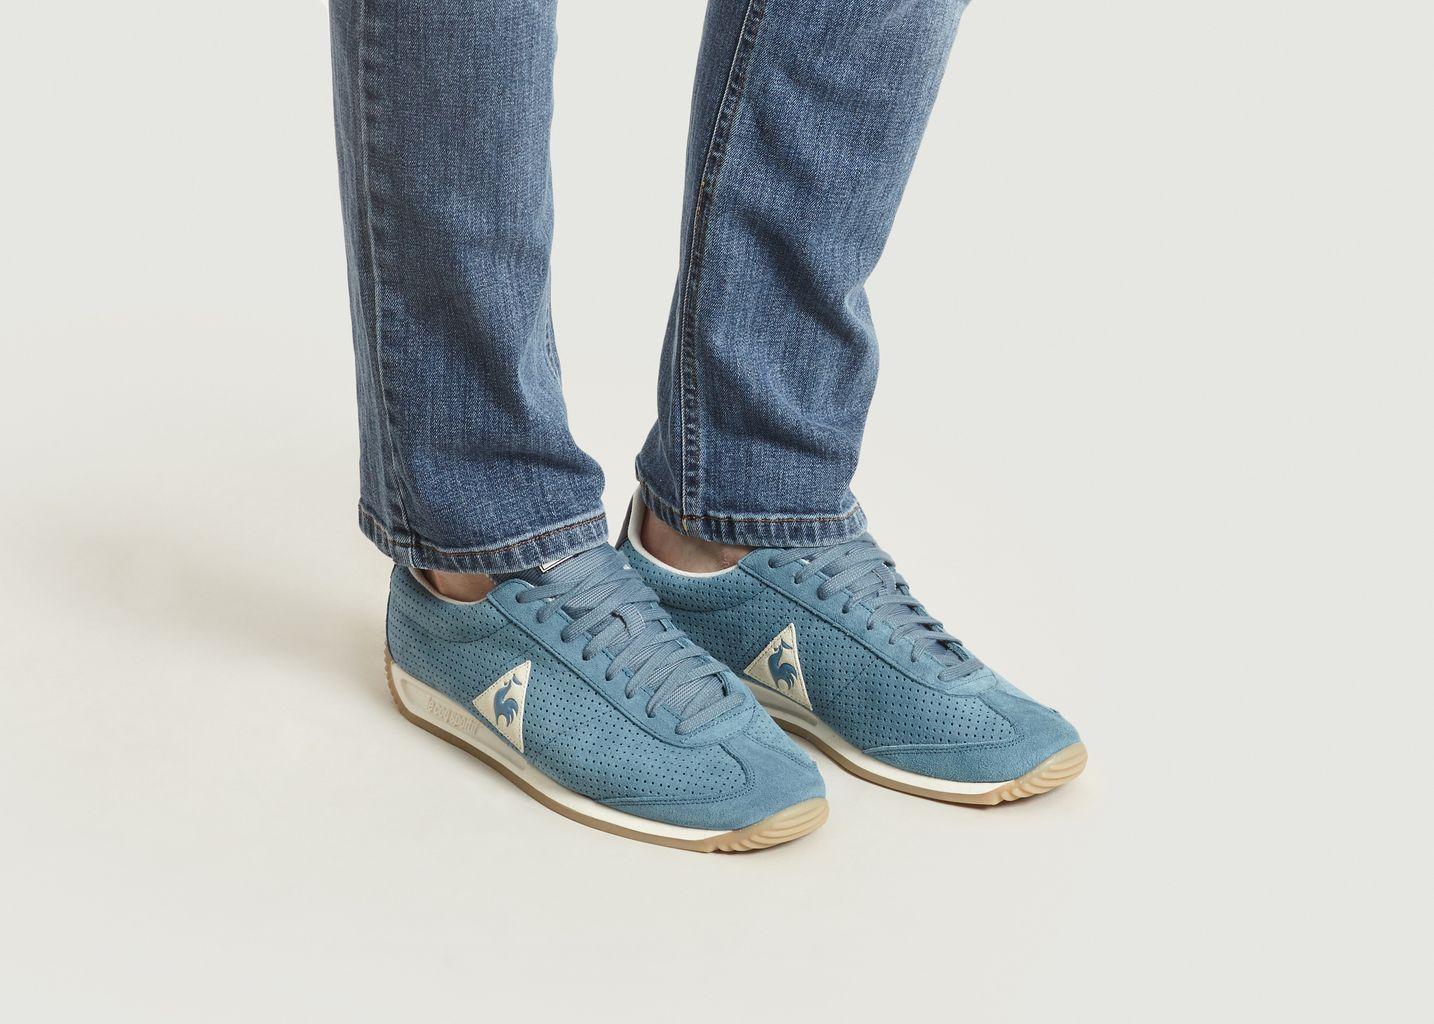 6311b16e4430 Sneakers Quartz Premium Bleu Clair Le Coq Sportif